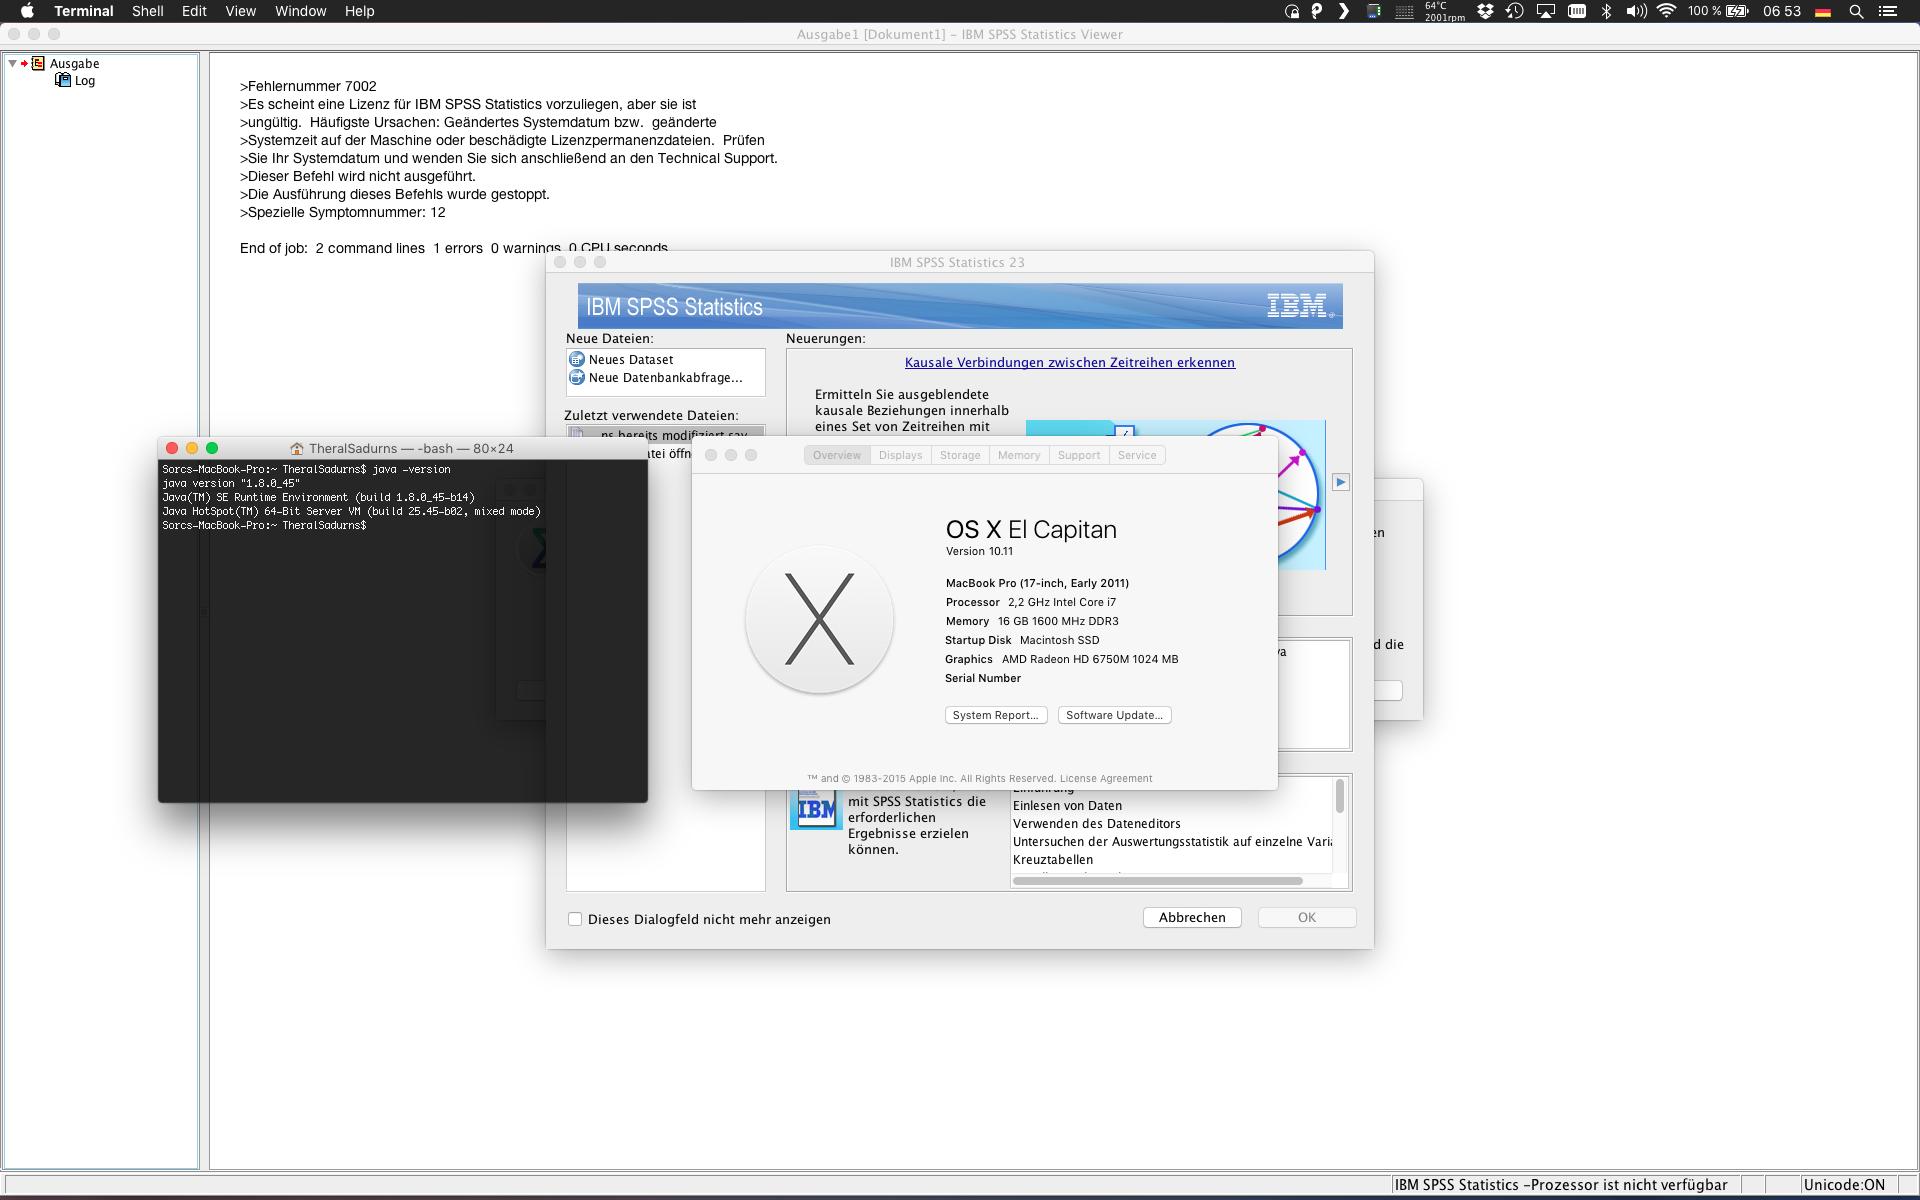 Legacy Java Se 6 Runtime For Mac Os High Sierra - mamavopan.over-blog.com